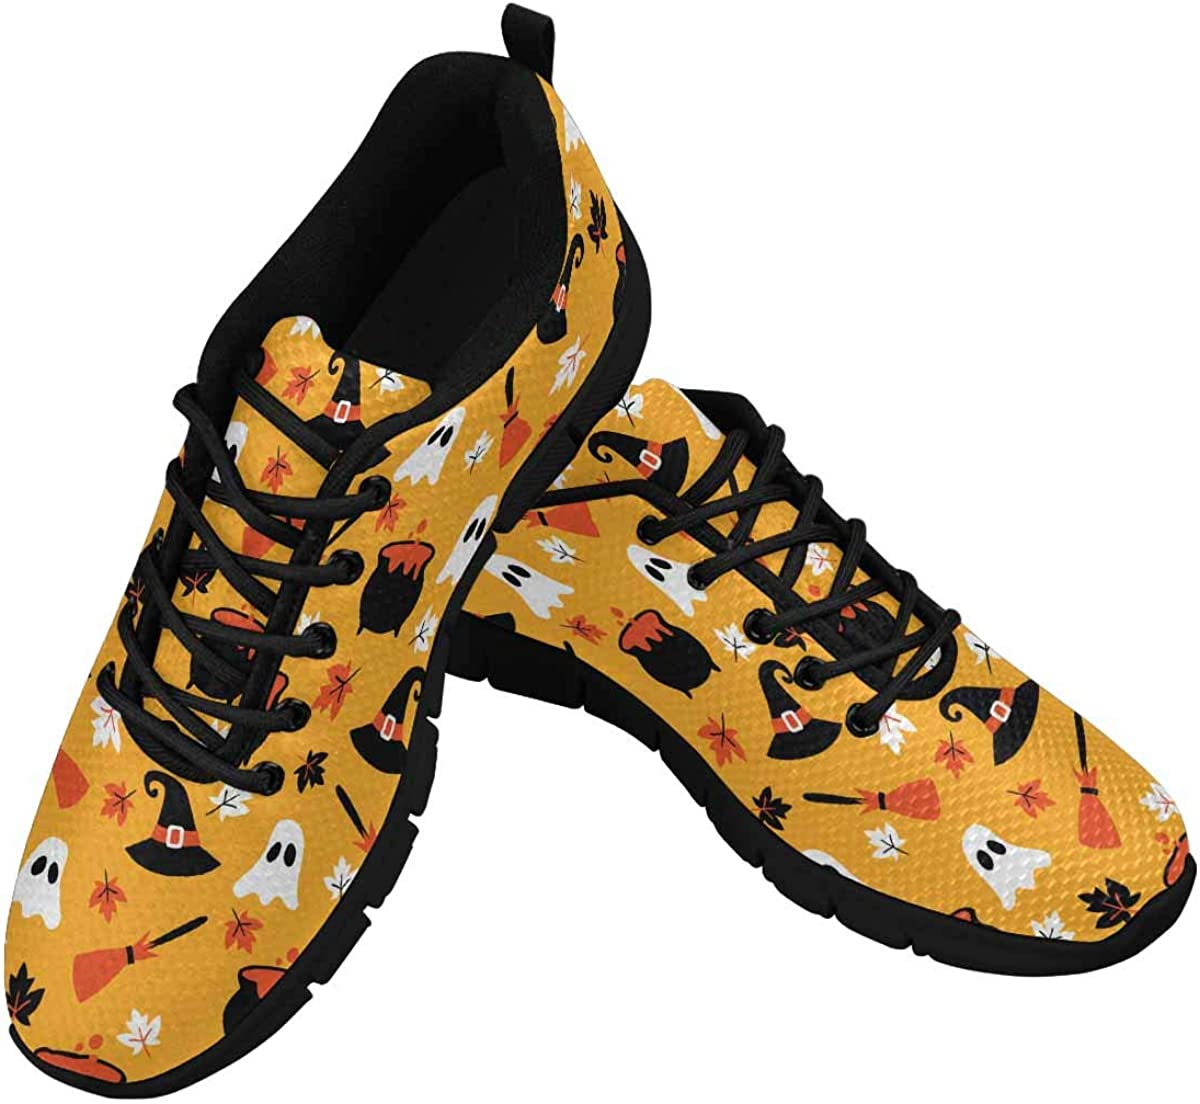 INTERESTPRINT Halloween Pumpkin, Broom, Hat Women's Athletic Walking Shoes Casual Mesh Comfortable Work Sneakers